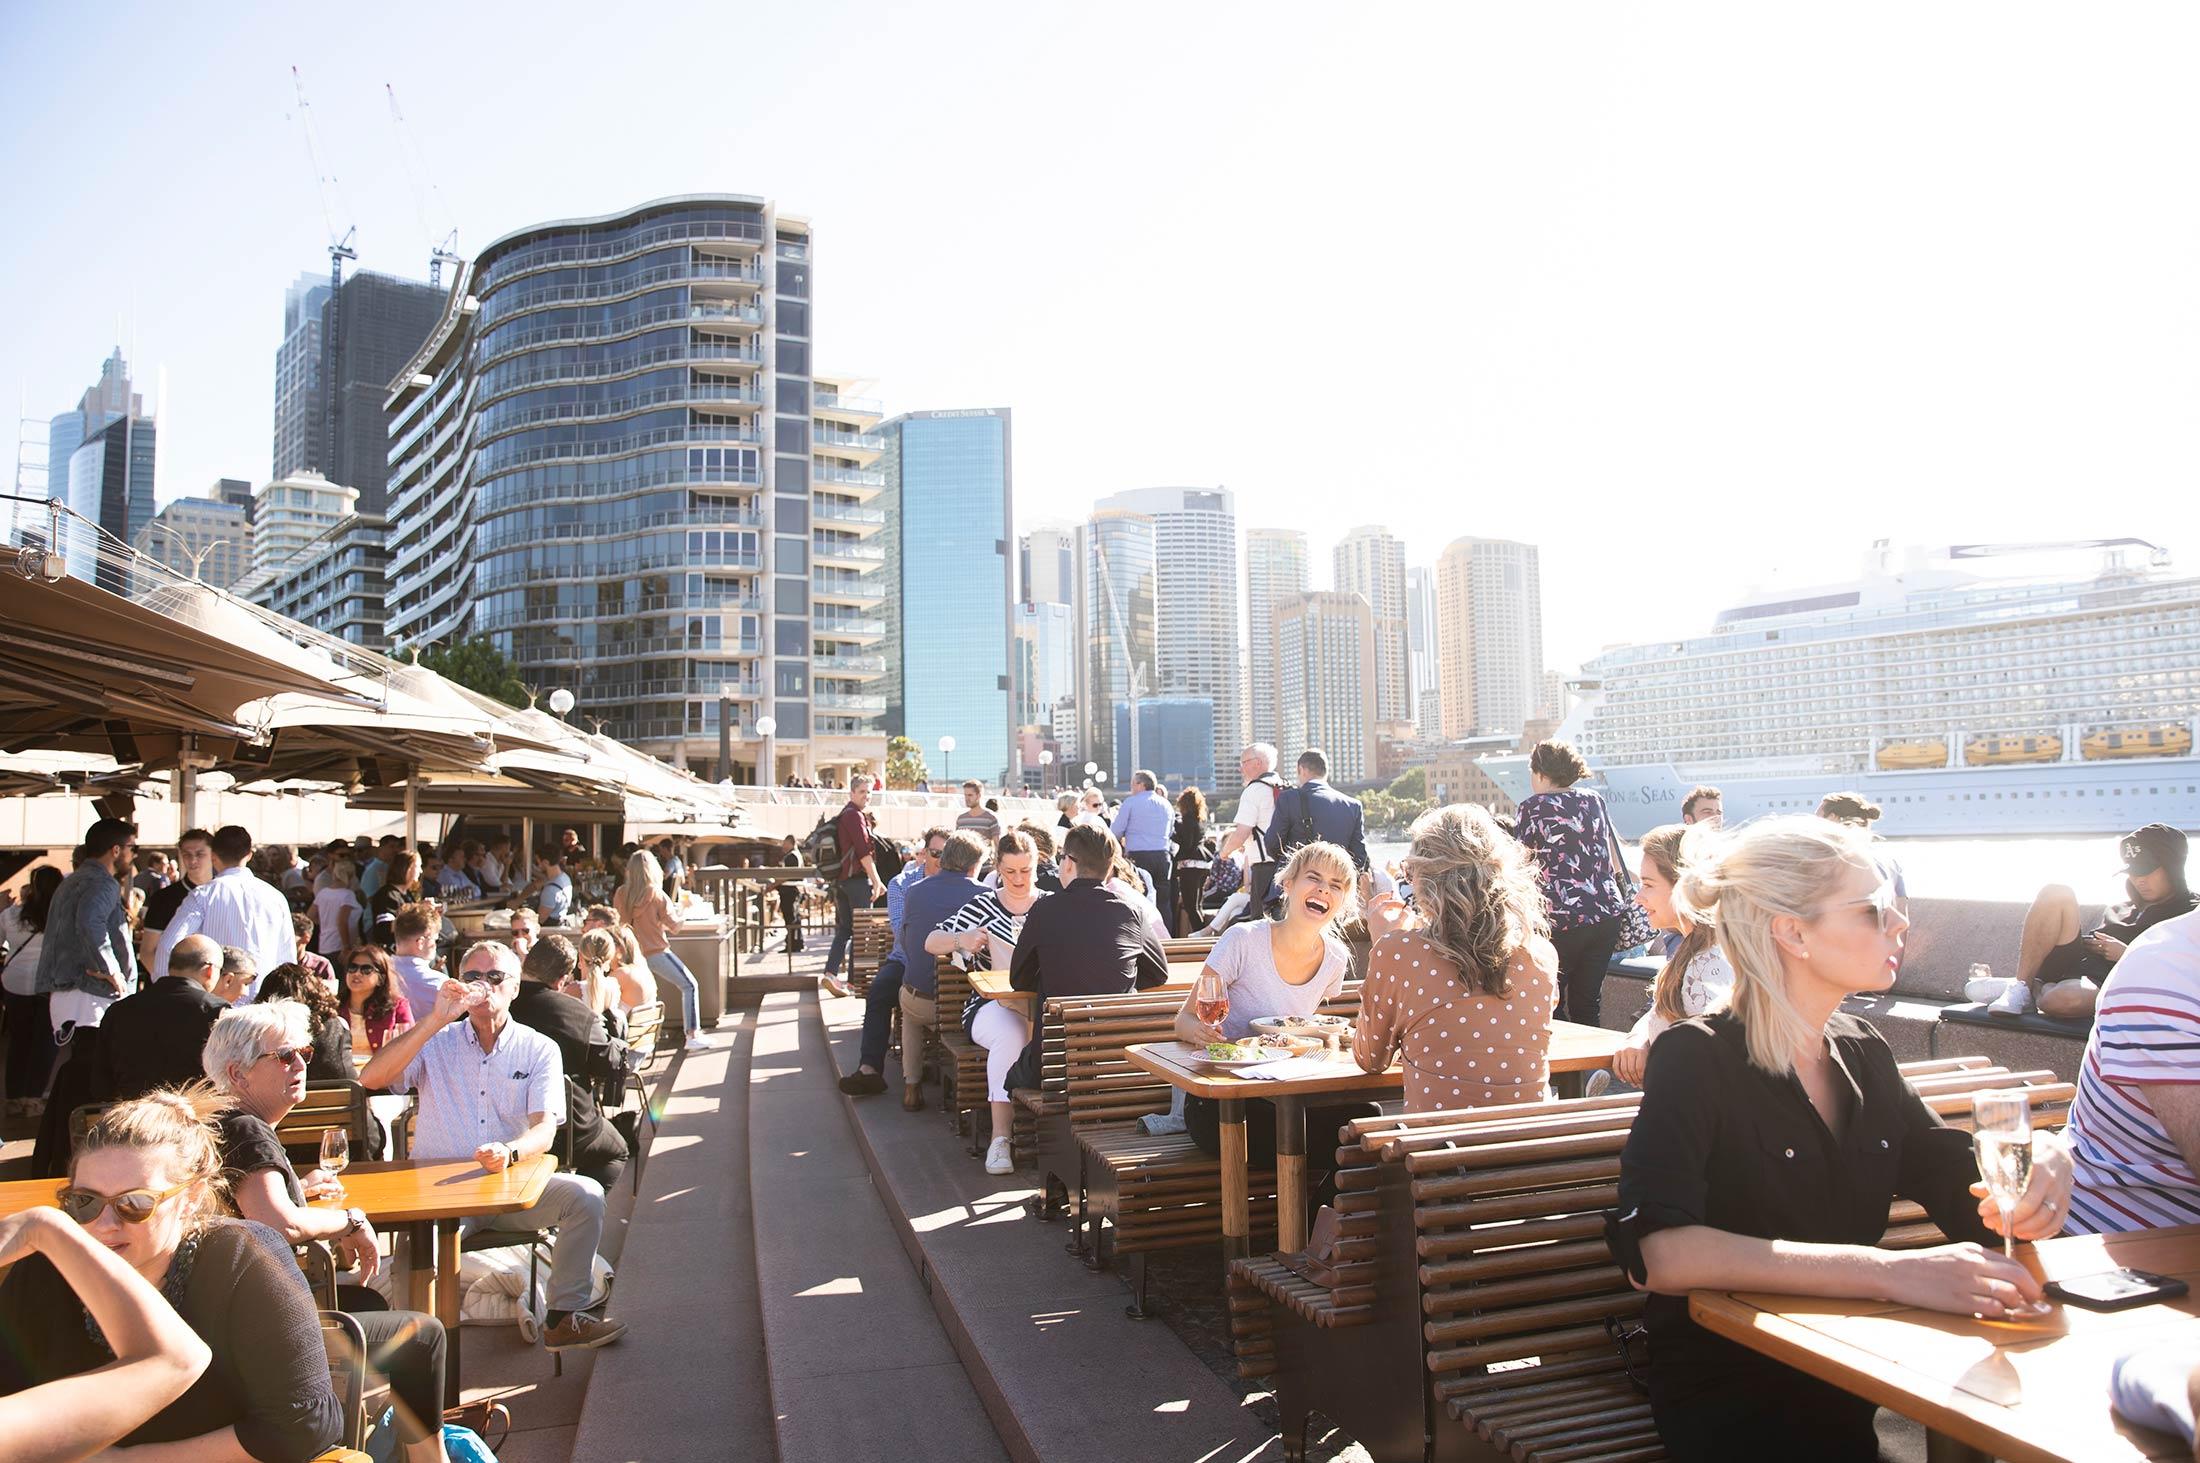 opera-bar-sydney-opera-house-destination-nsw-photo-credit